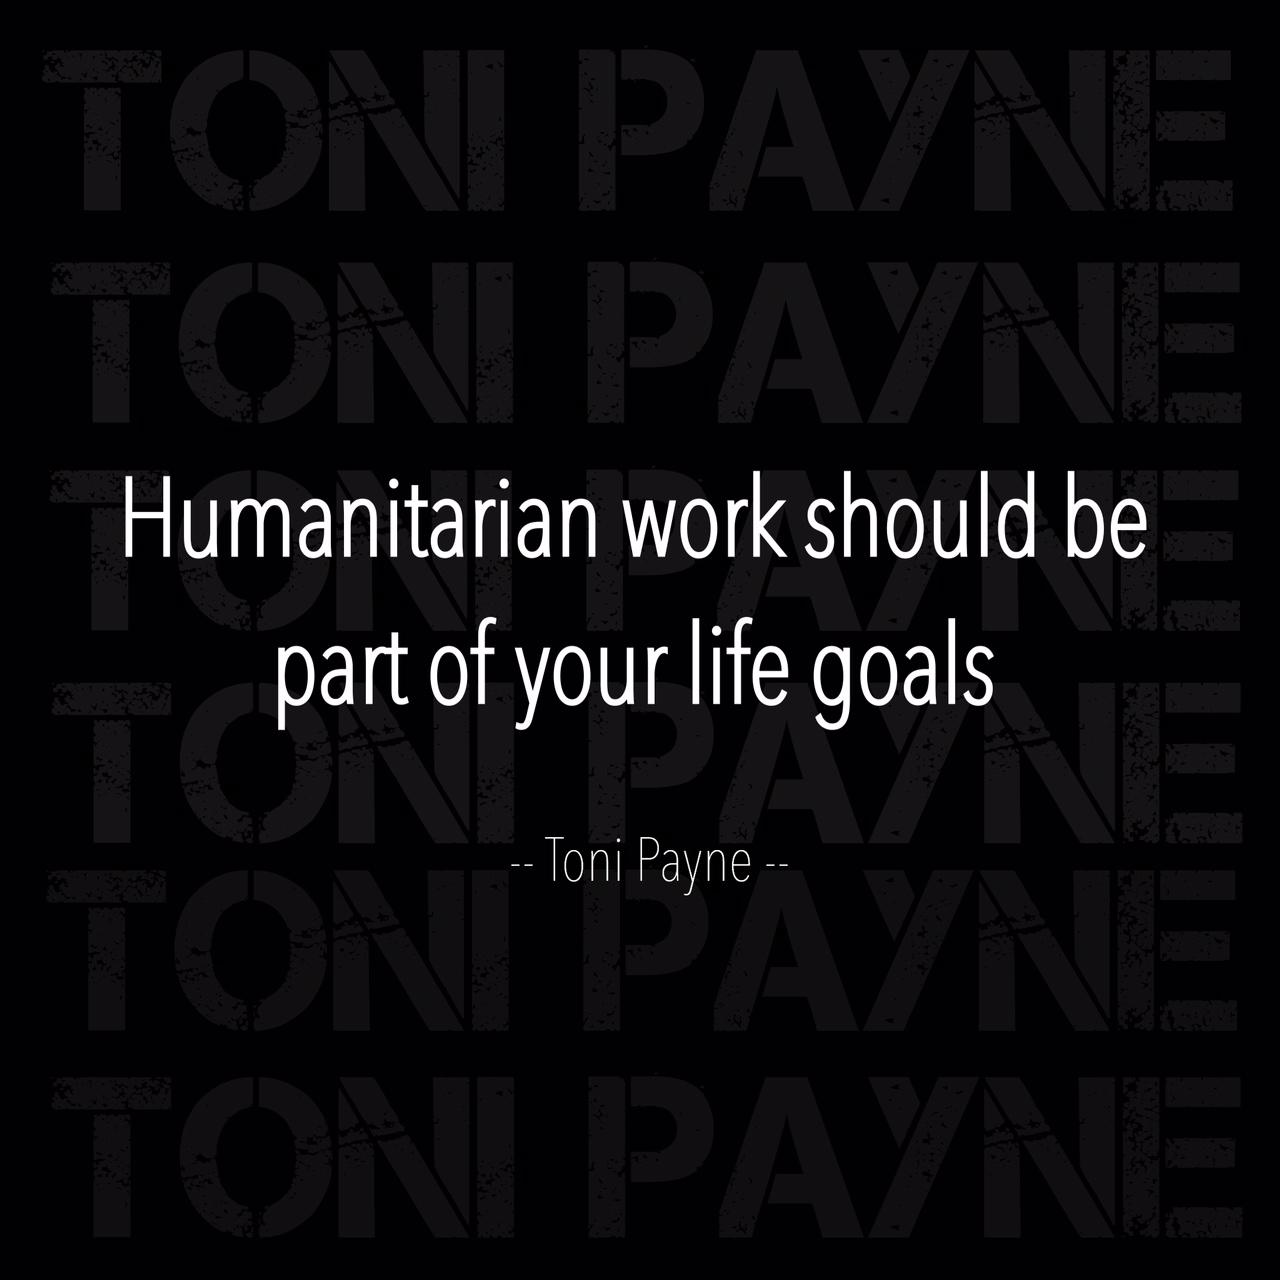 humanitarian work quote